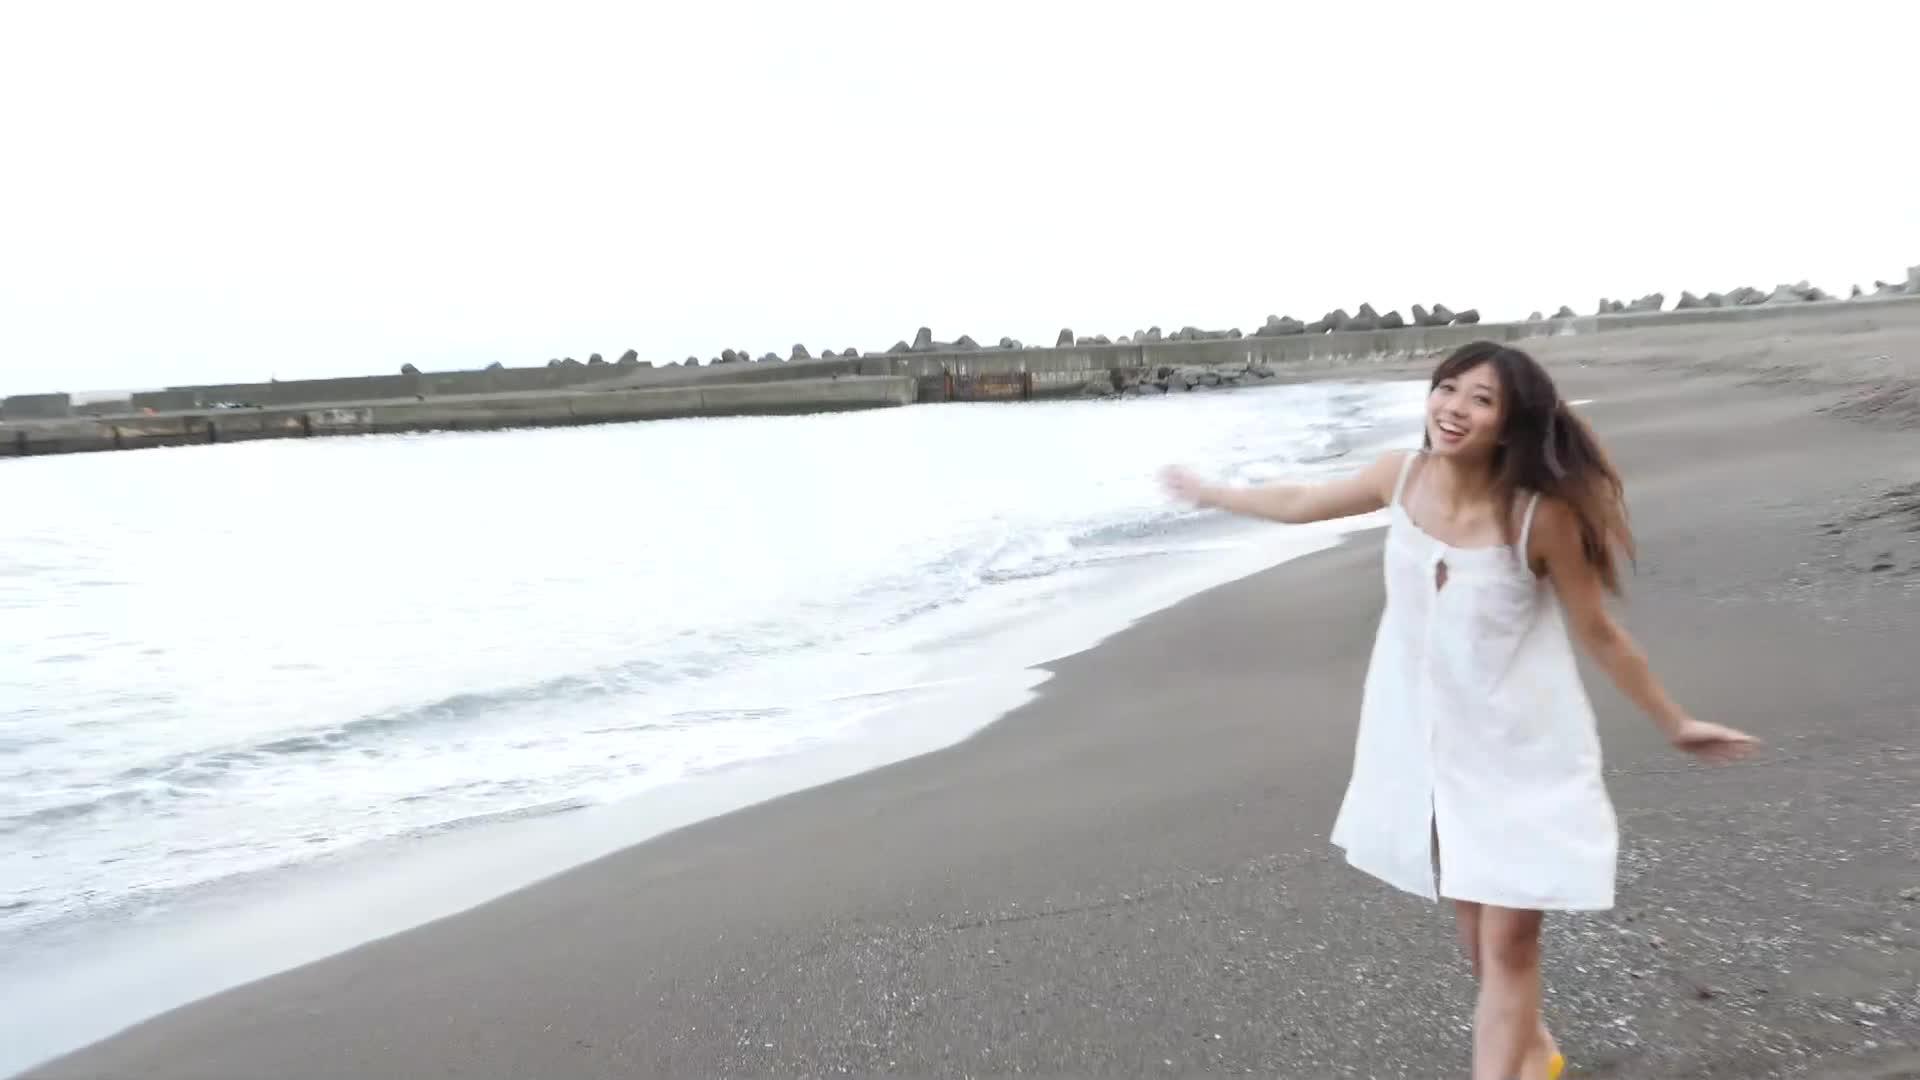 c15 - 乙女の恋心/大貫彩香